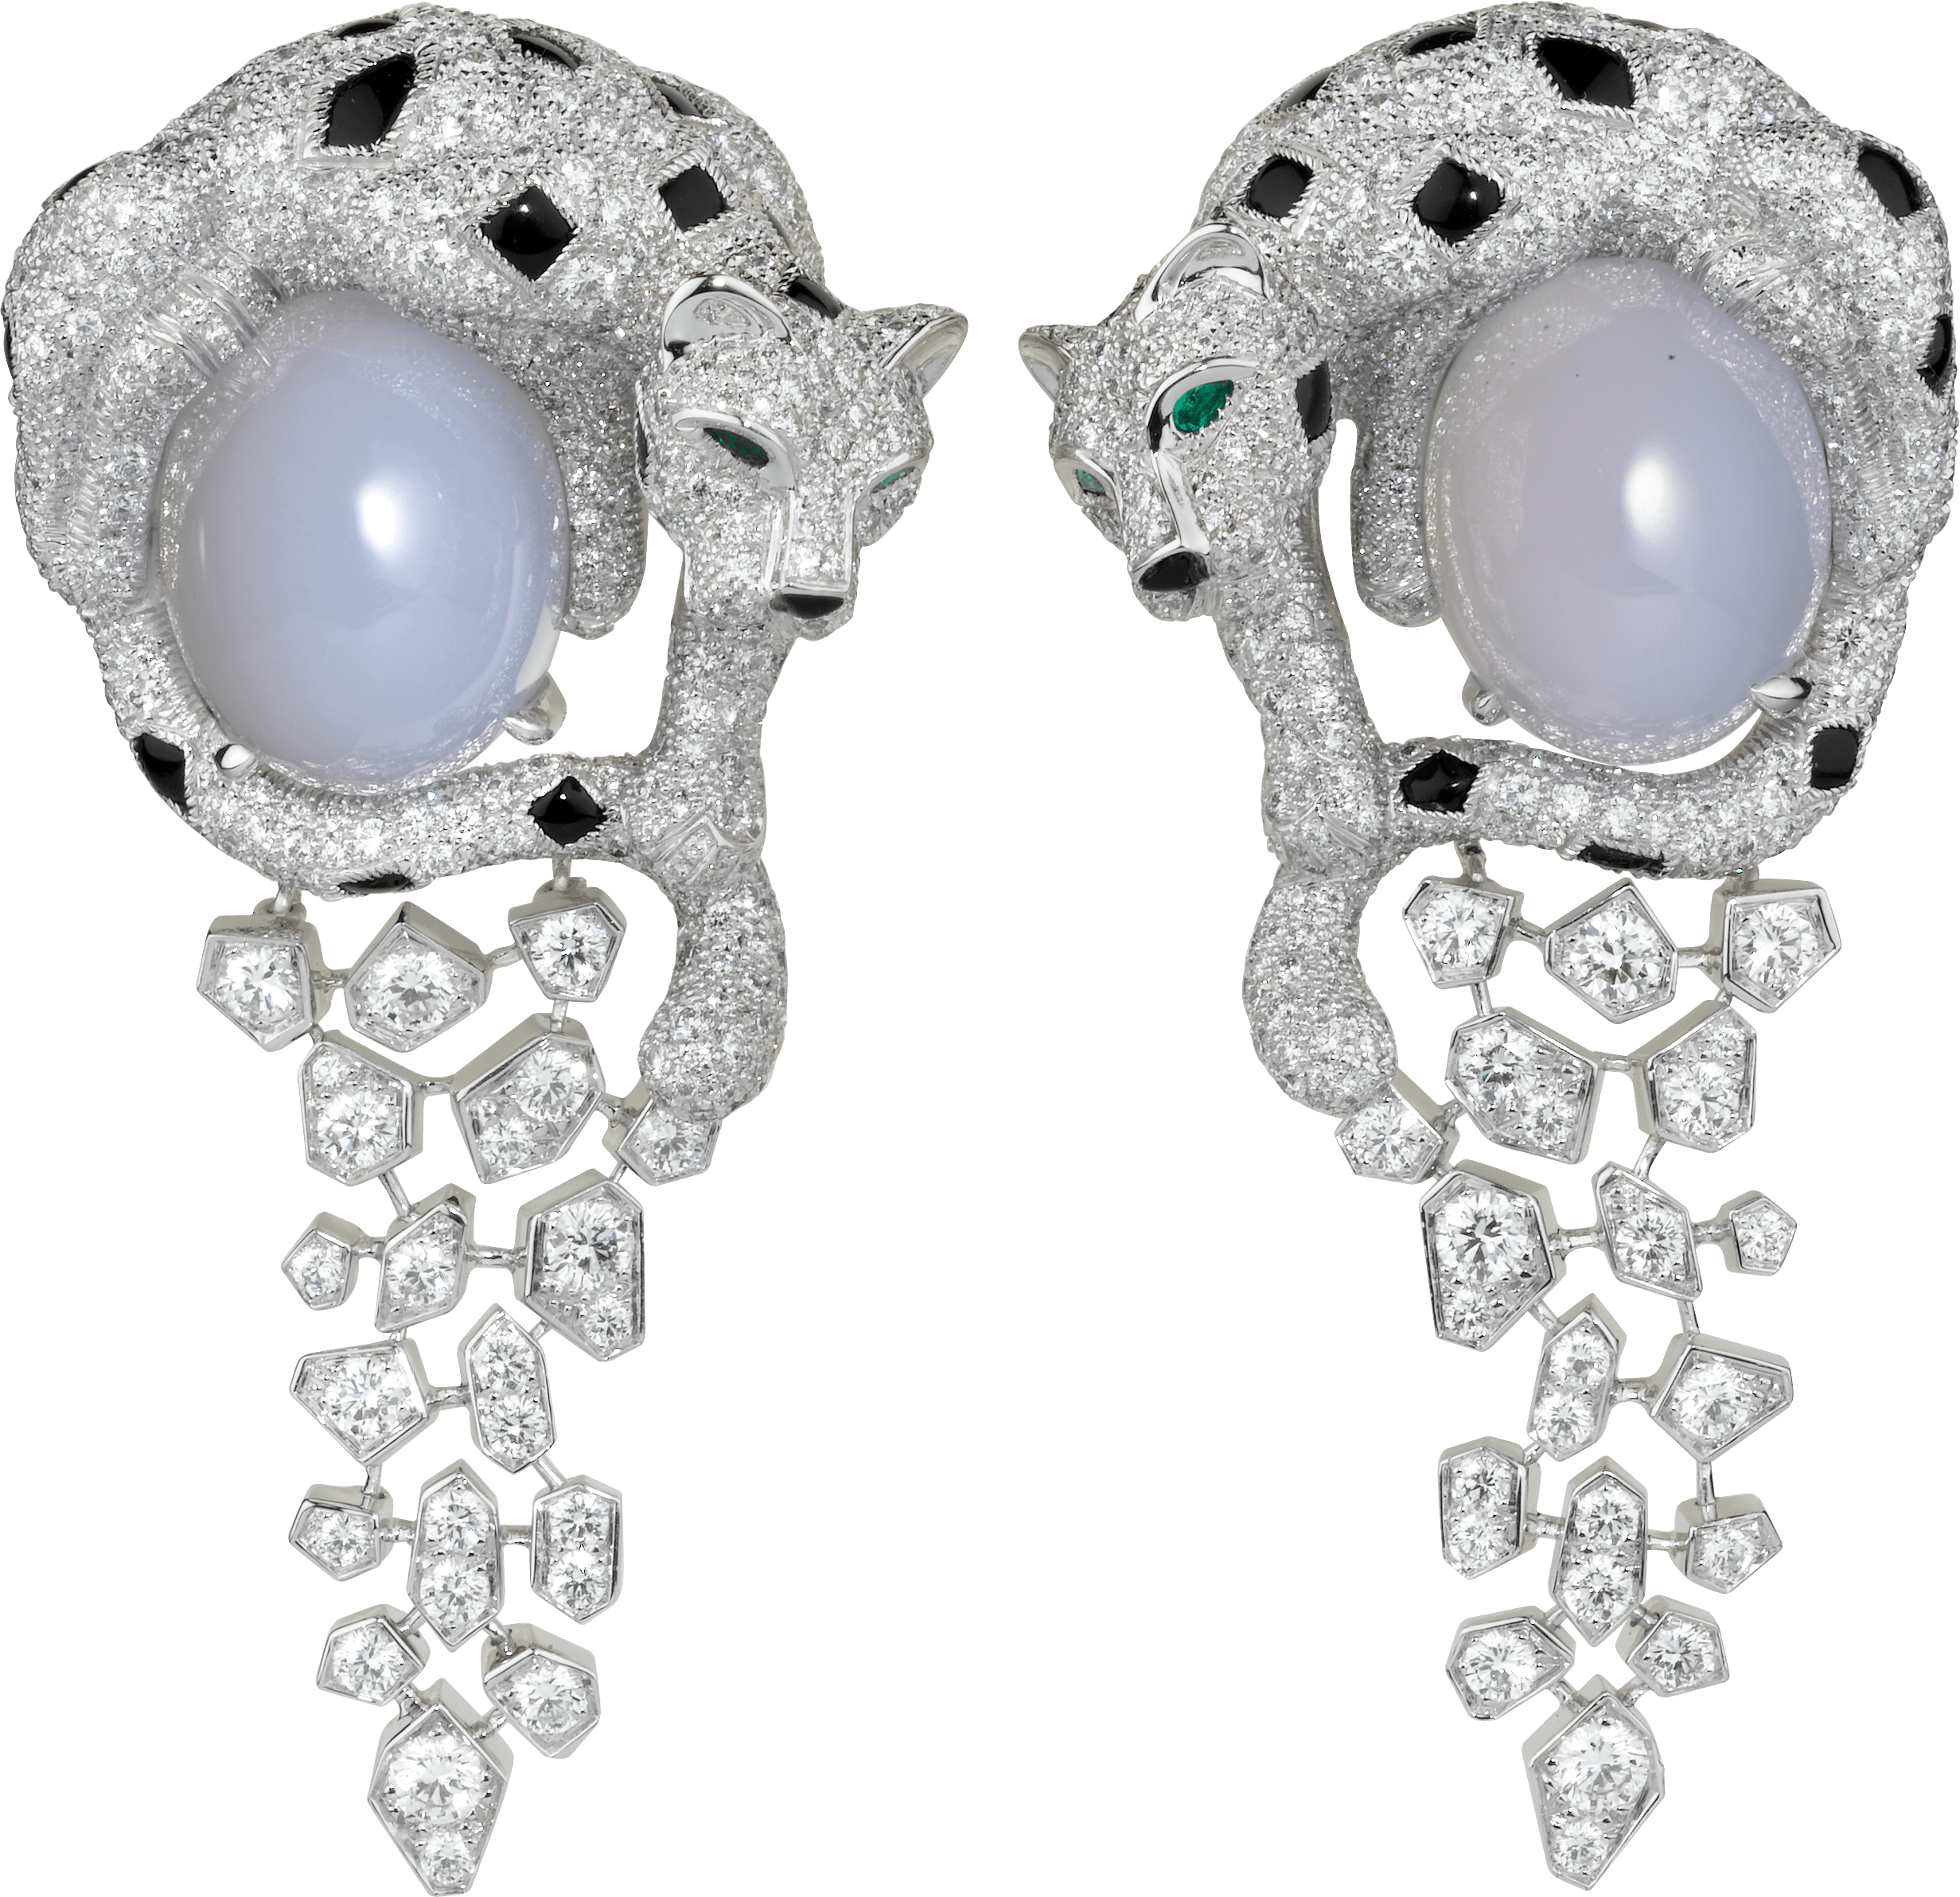 Cartier Royal美洲豹頂級珠寶系列藍玉髓耳環白K金,祖母綠,2顆玉髓,圓形明亮式切割鑽石,縞瑪瑙。參考價格約NT$ 9,250,000